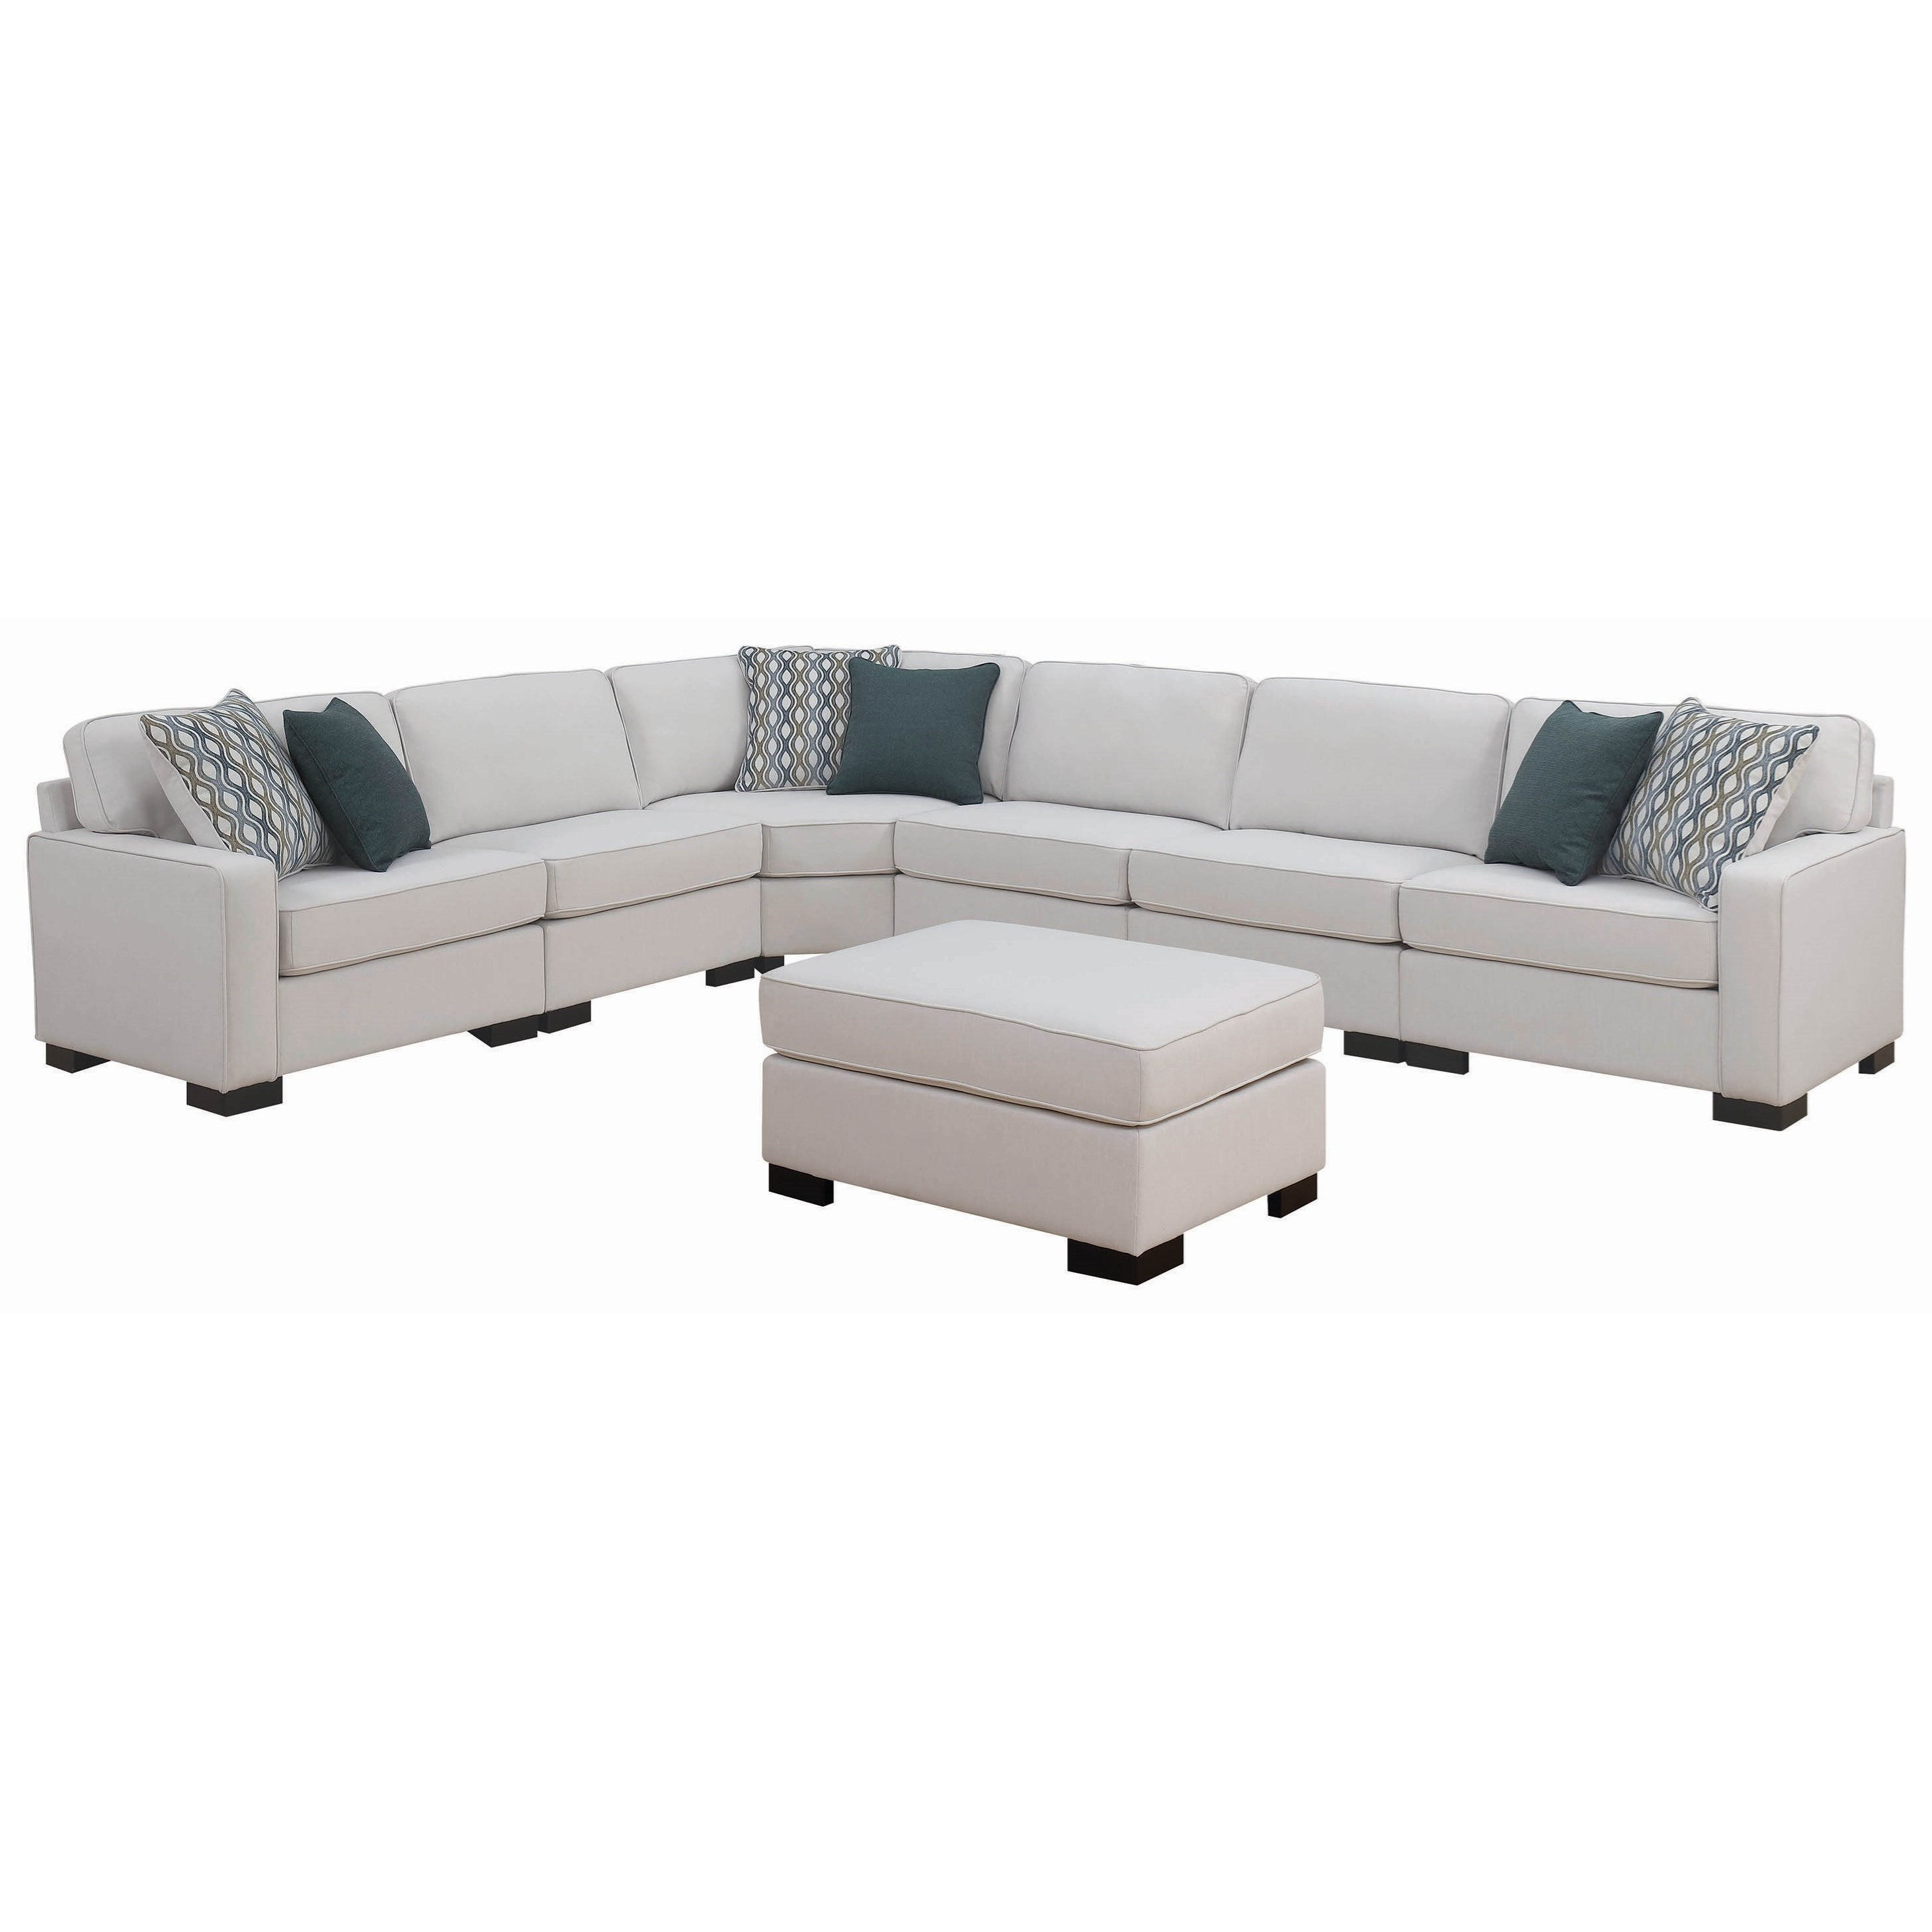 Scott Living Wylder Sectional Sofa Value City Furniture